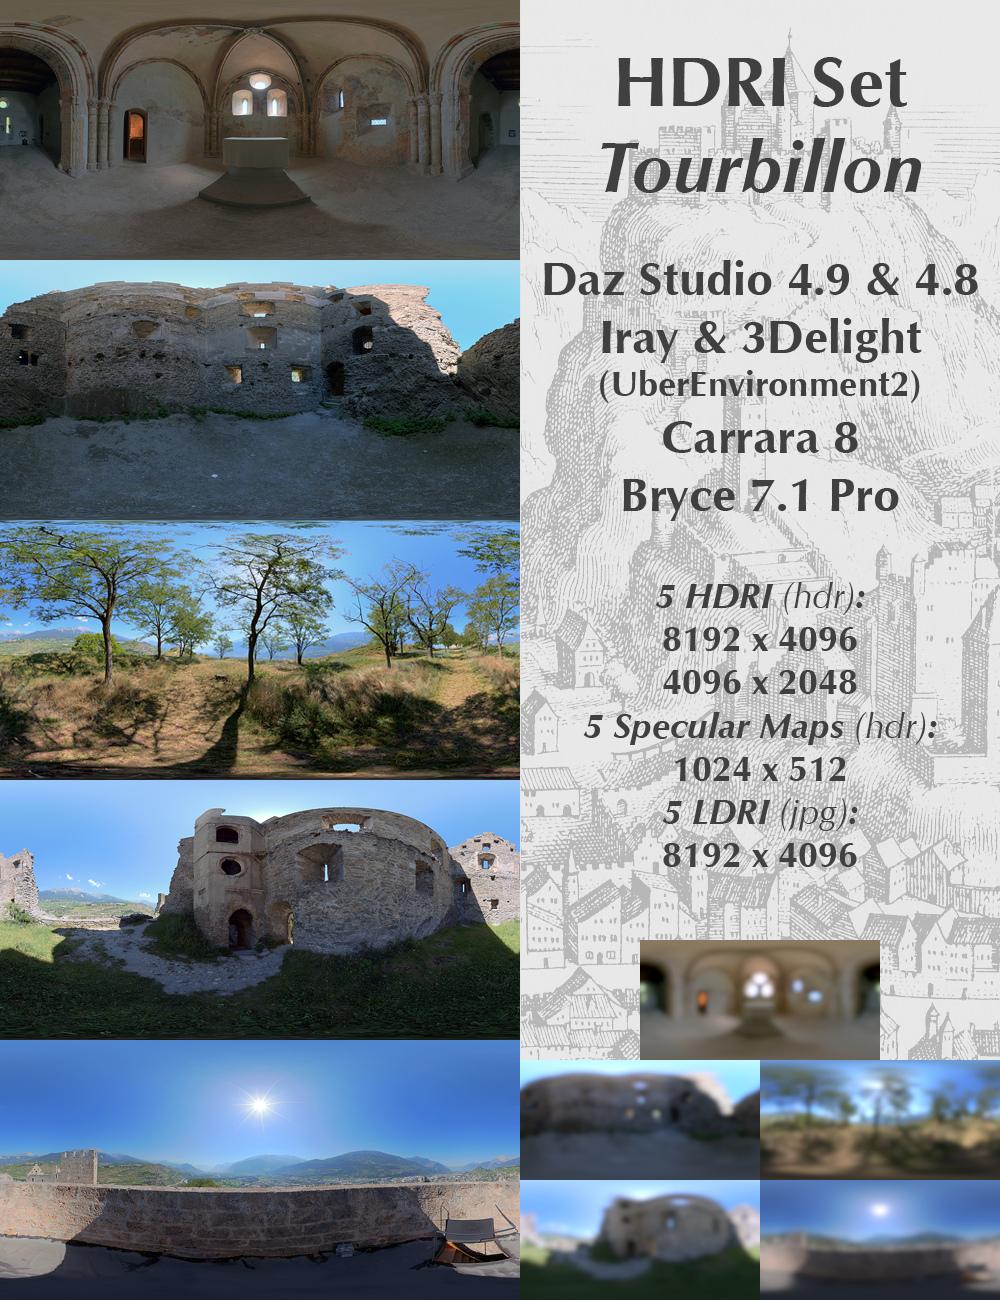 HDRI Set Tourbillon by: Horo, 3D Models by Daz 3D